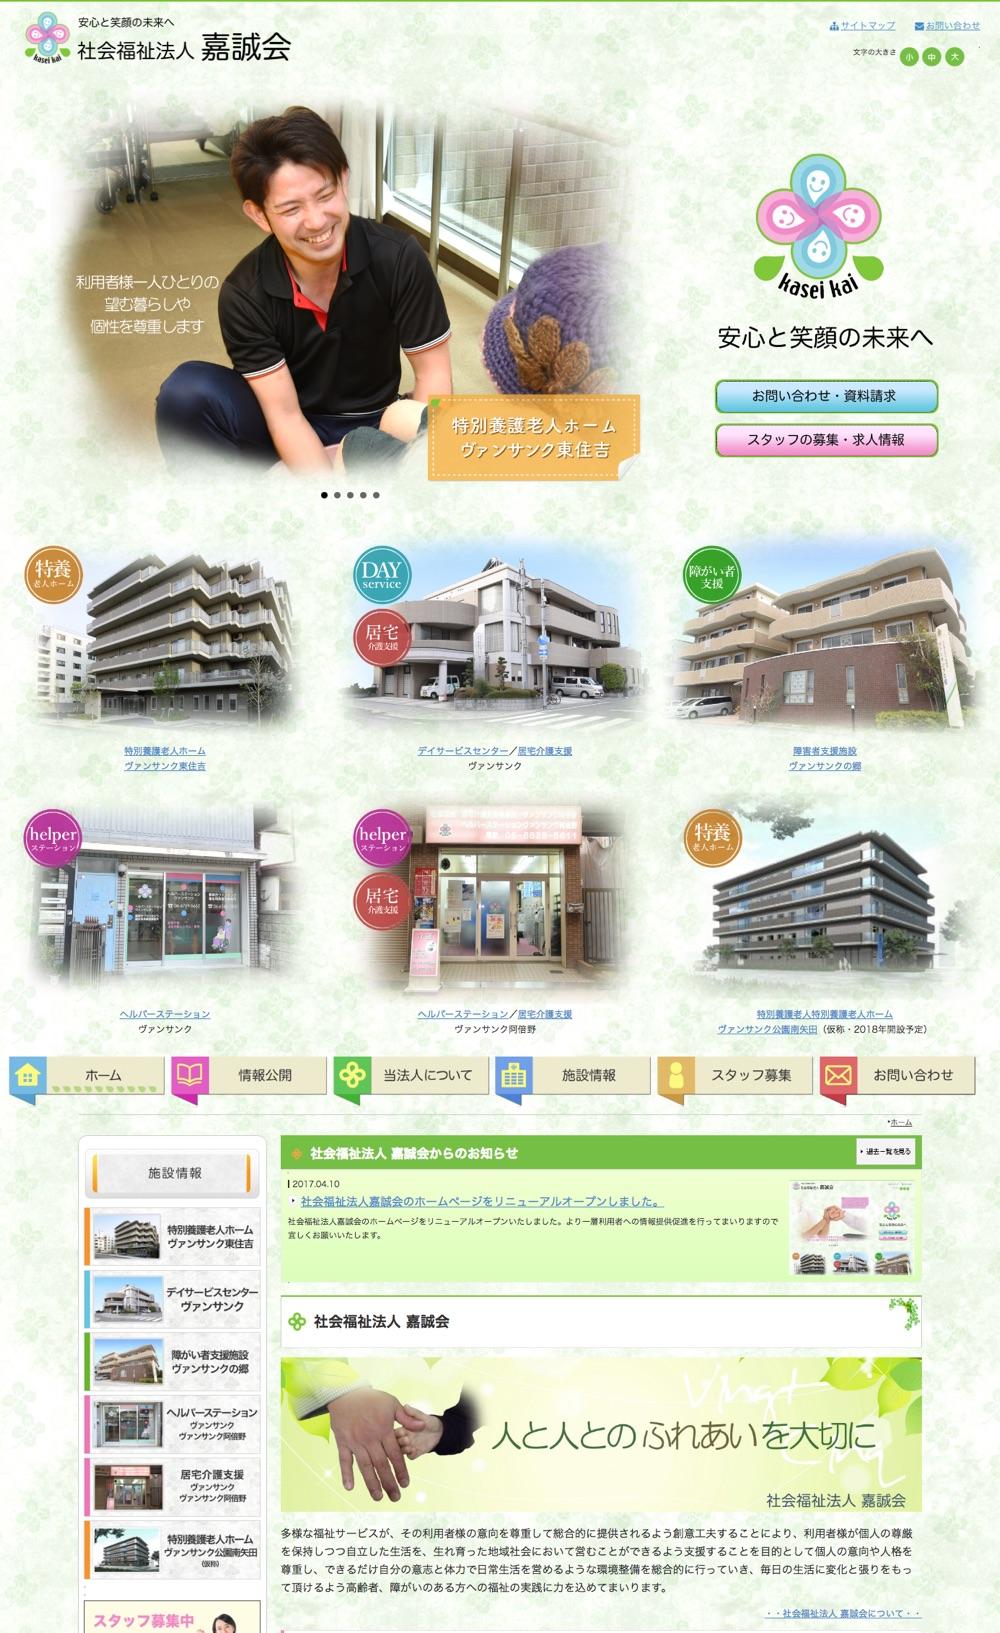 ホームページ制作事例 社会福祉法人嘉誠会